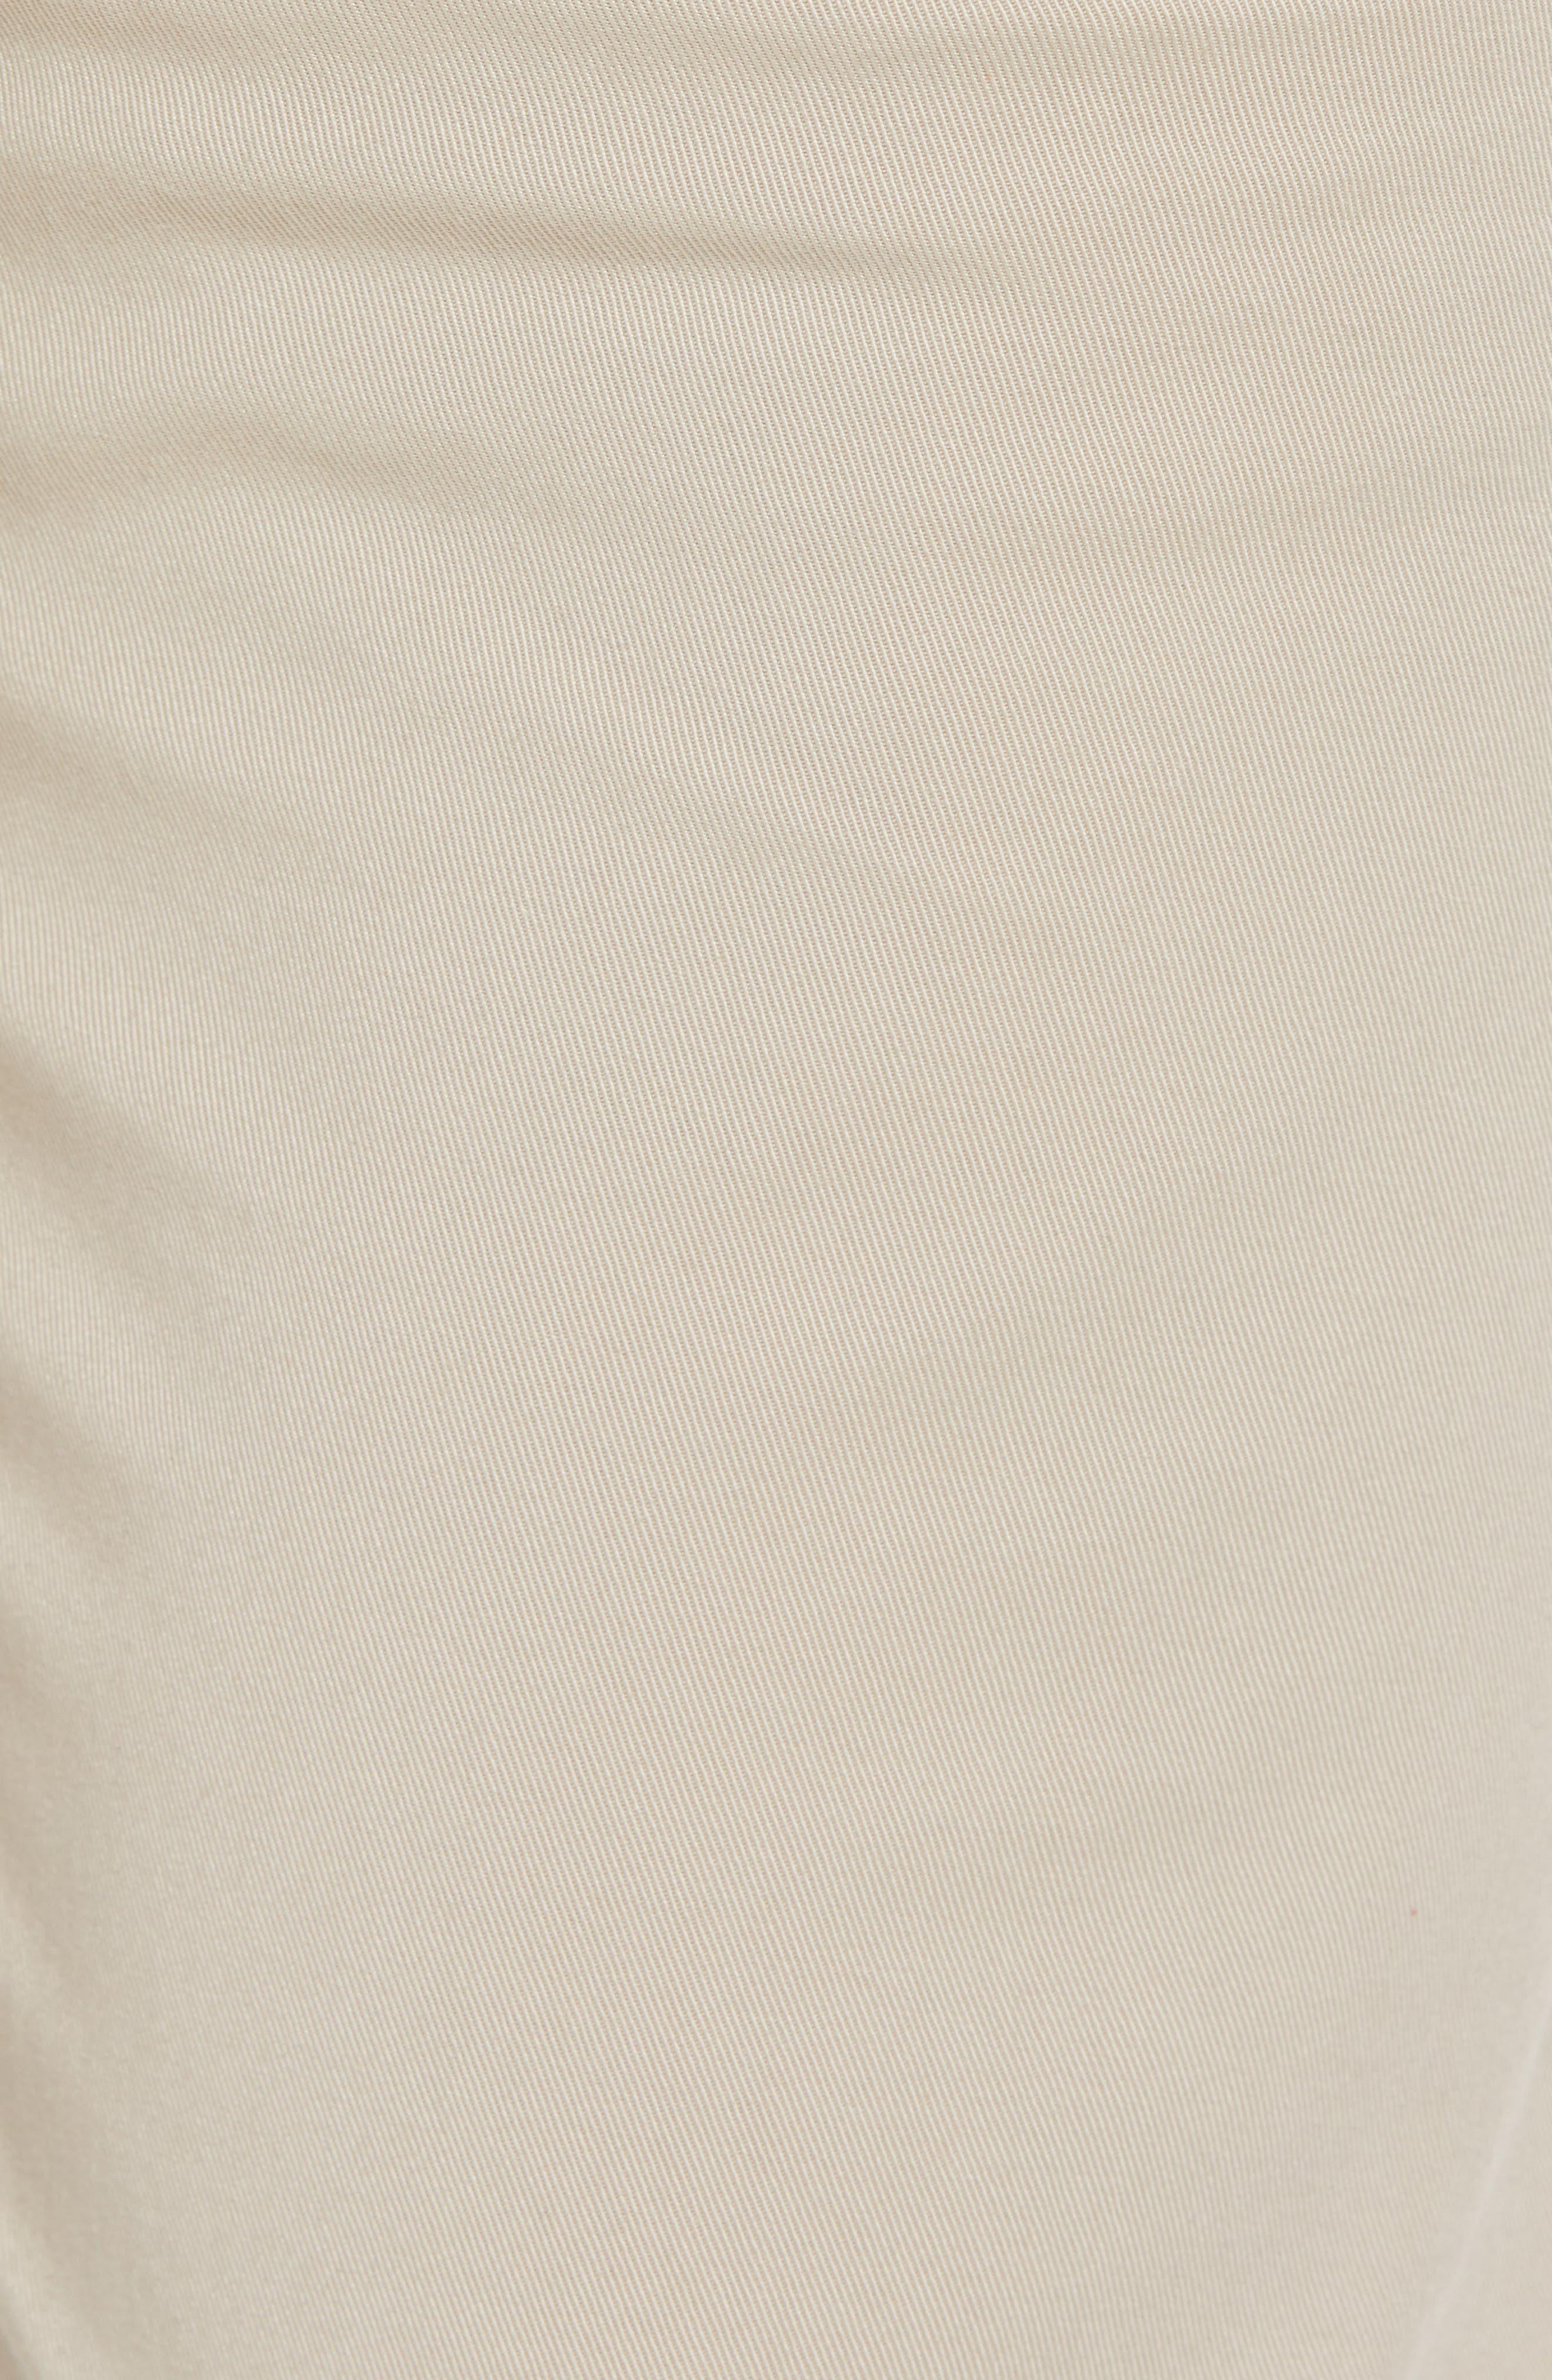 Rice Slim Fit Chino Pants,                             Alternate thumbnail 5, color,                             200